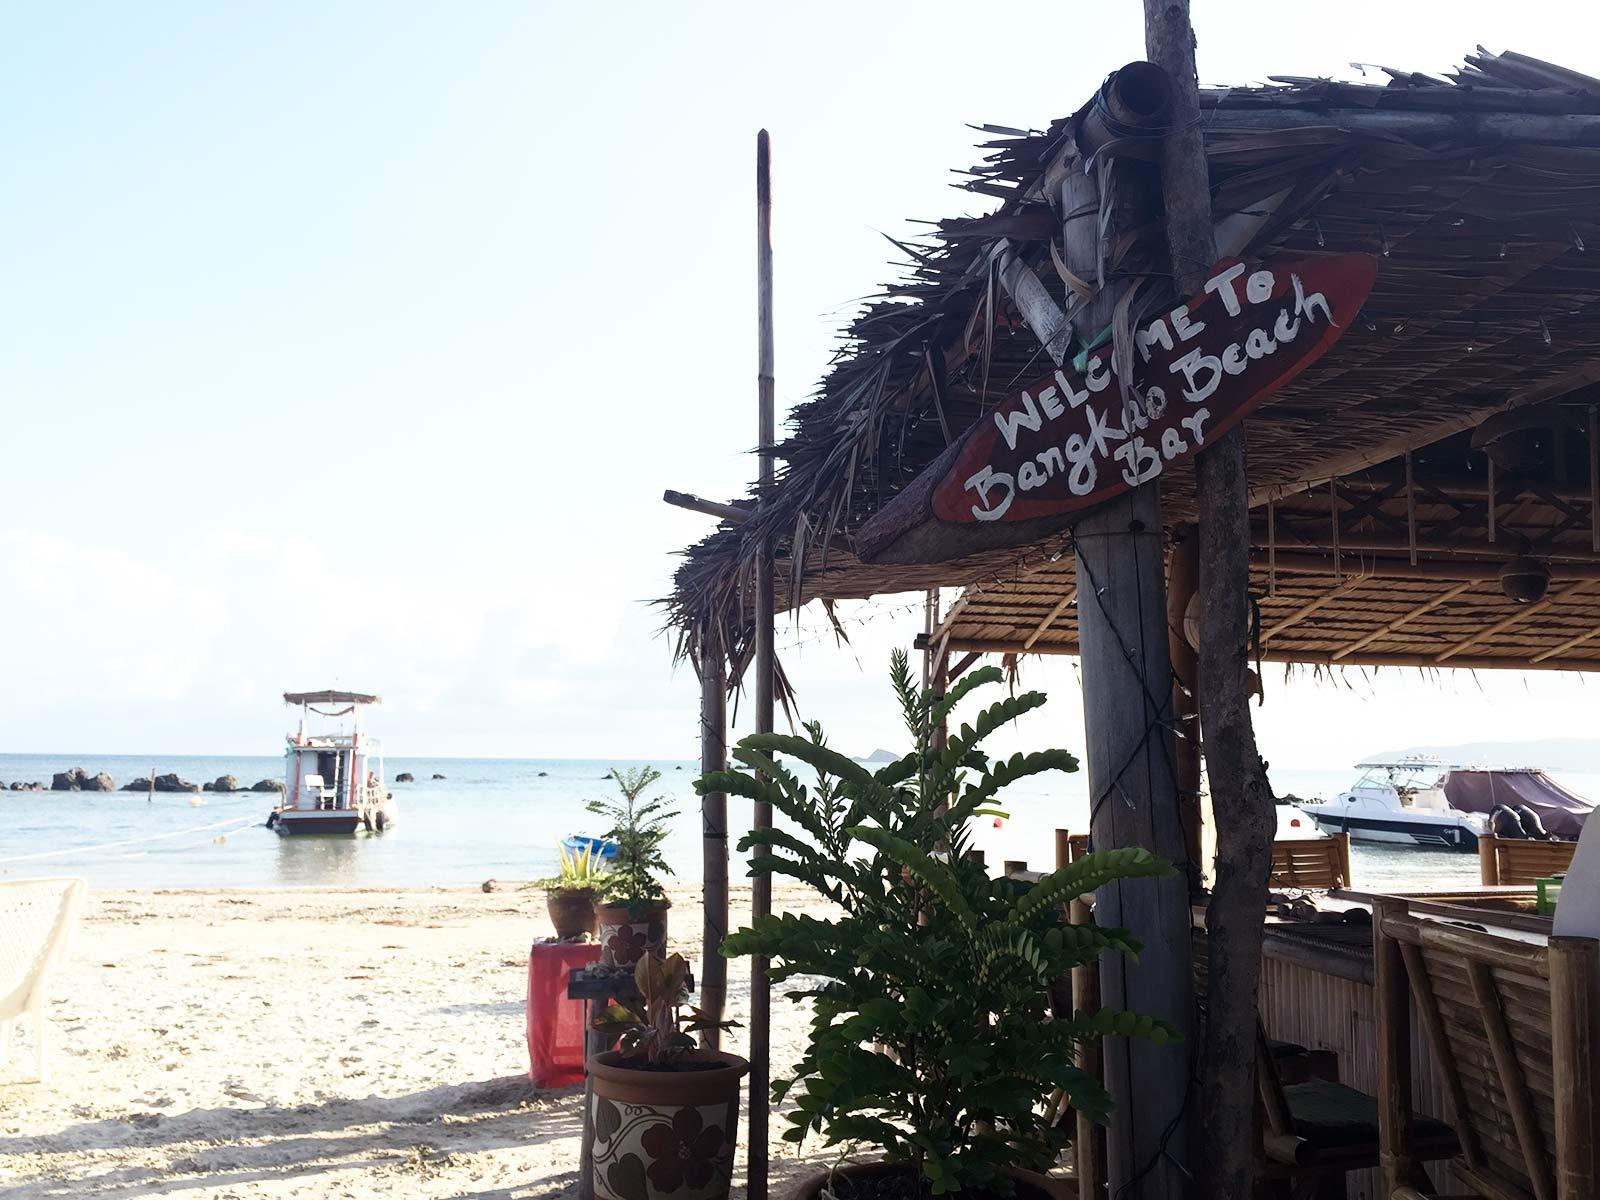 Thailand, Koh Samui, Bangkao Beach Bar